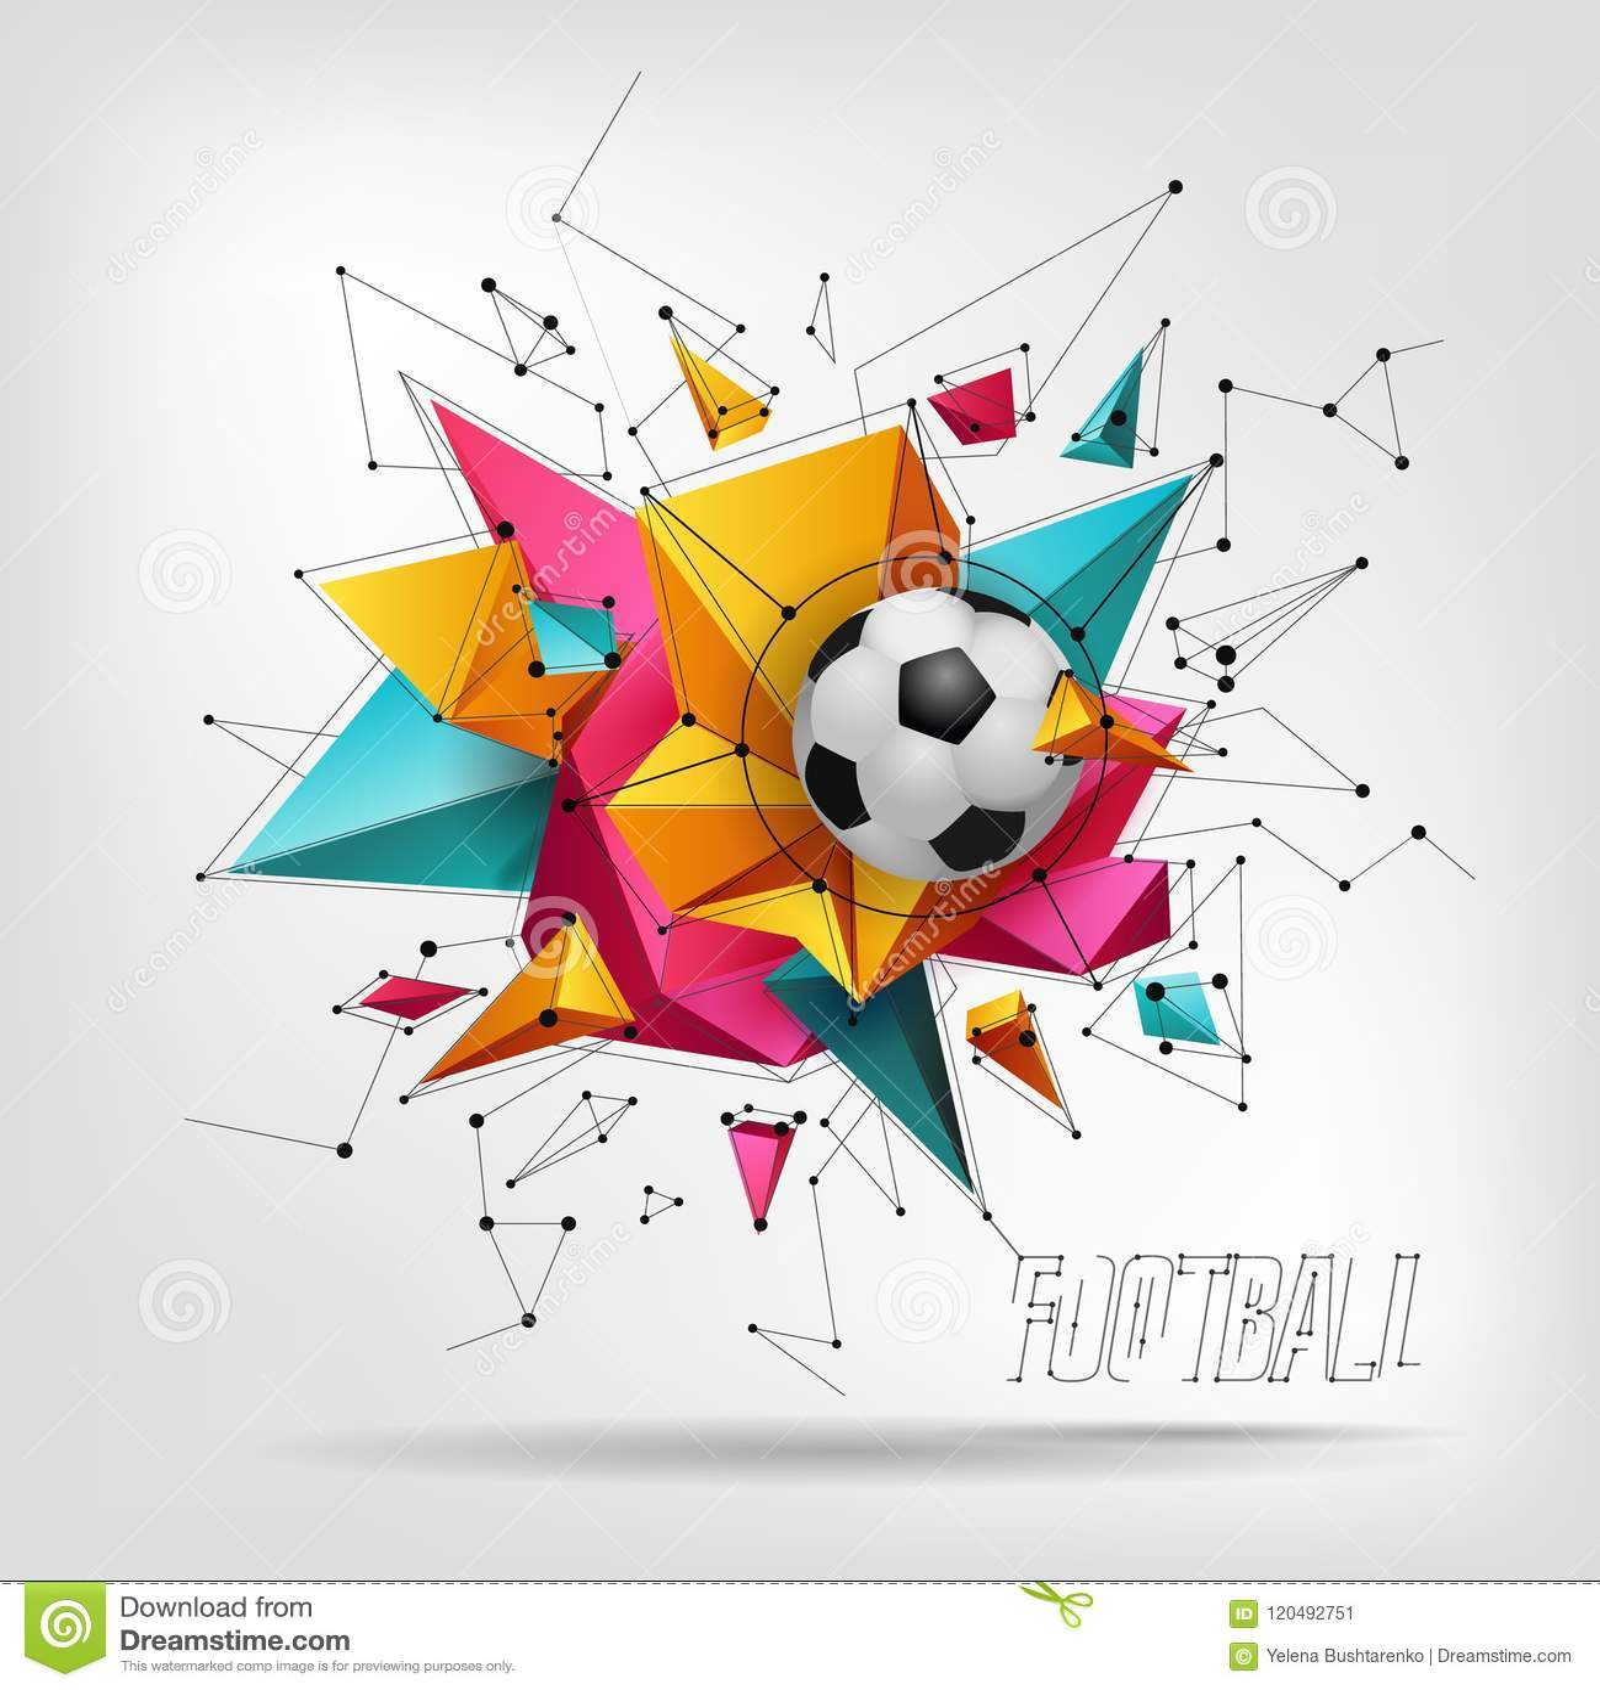 Origami American Football Ball 折り紙 アメリカンフットボール - YouTube   1390x1300